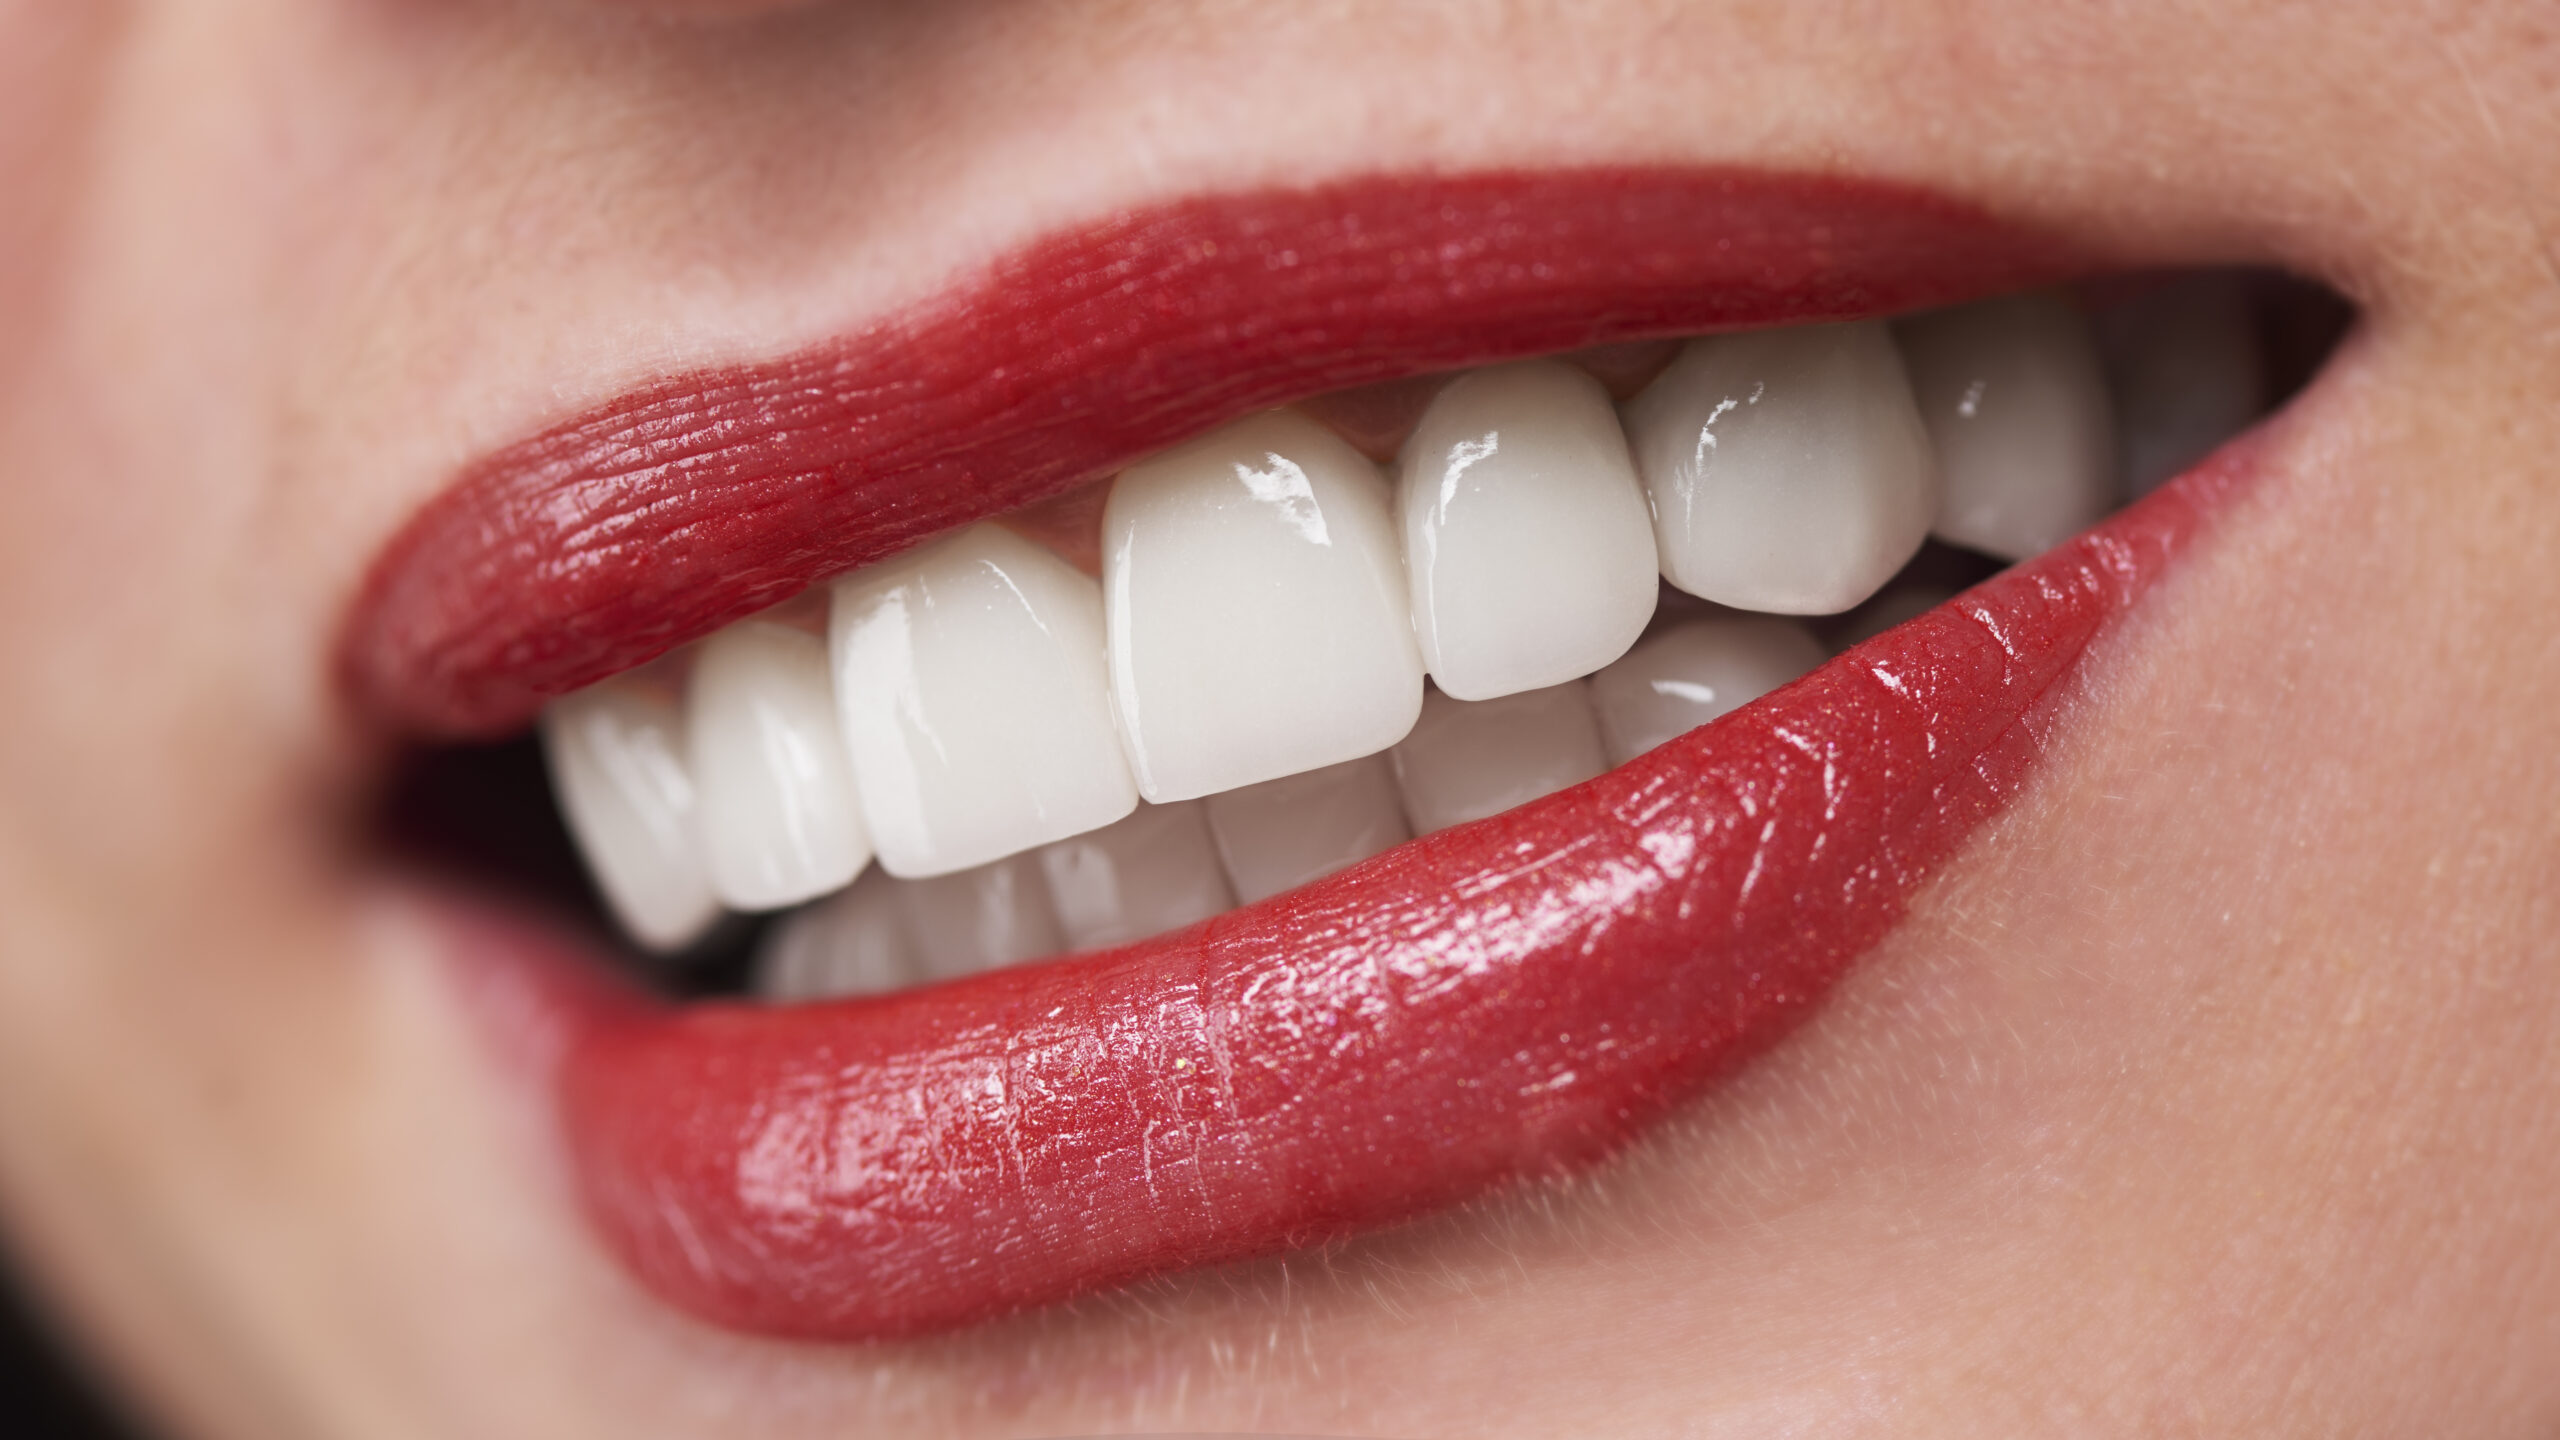 cosmetic dentist west palm beach